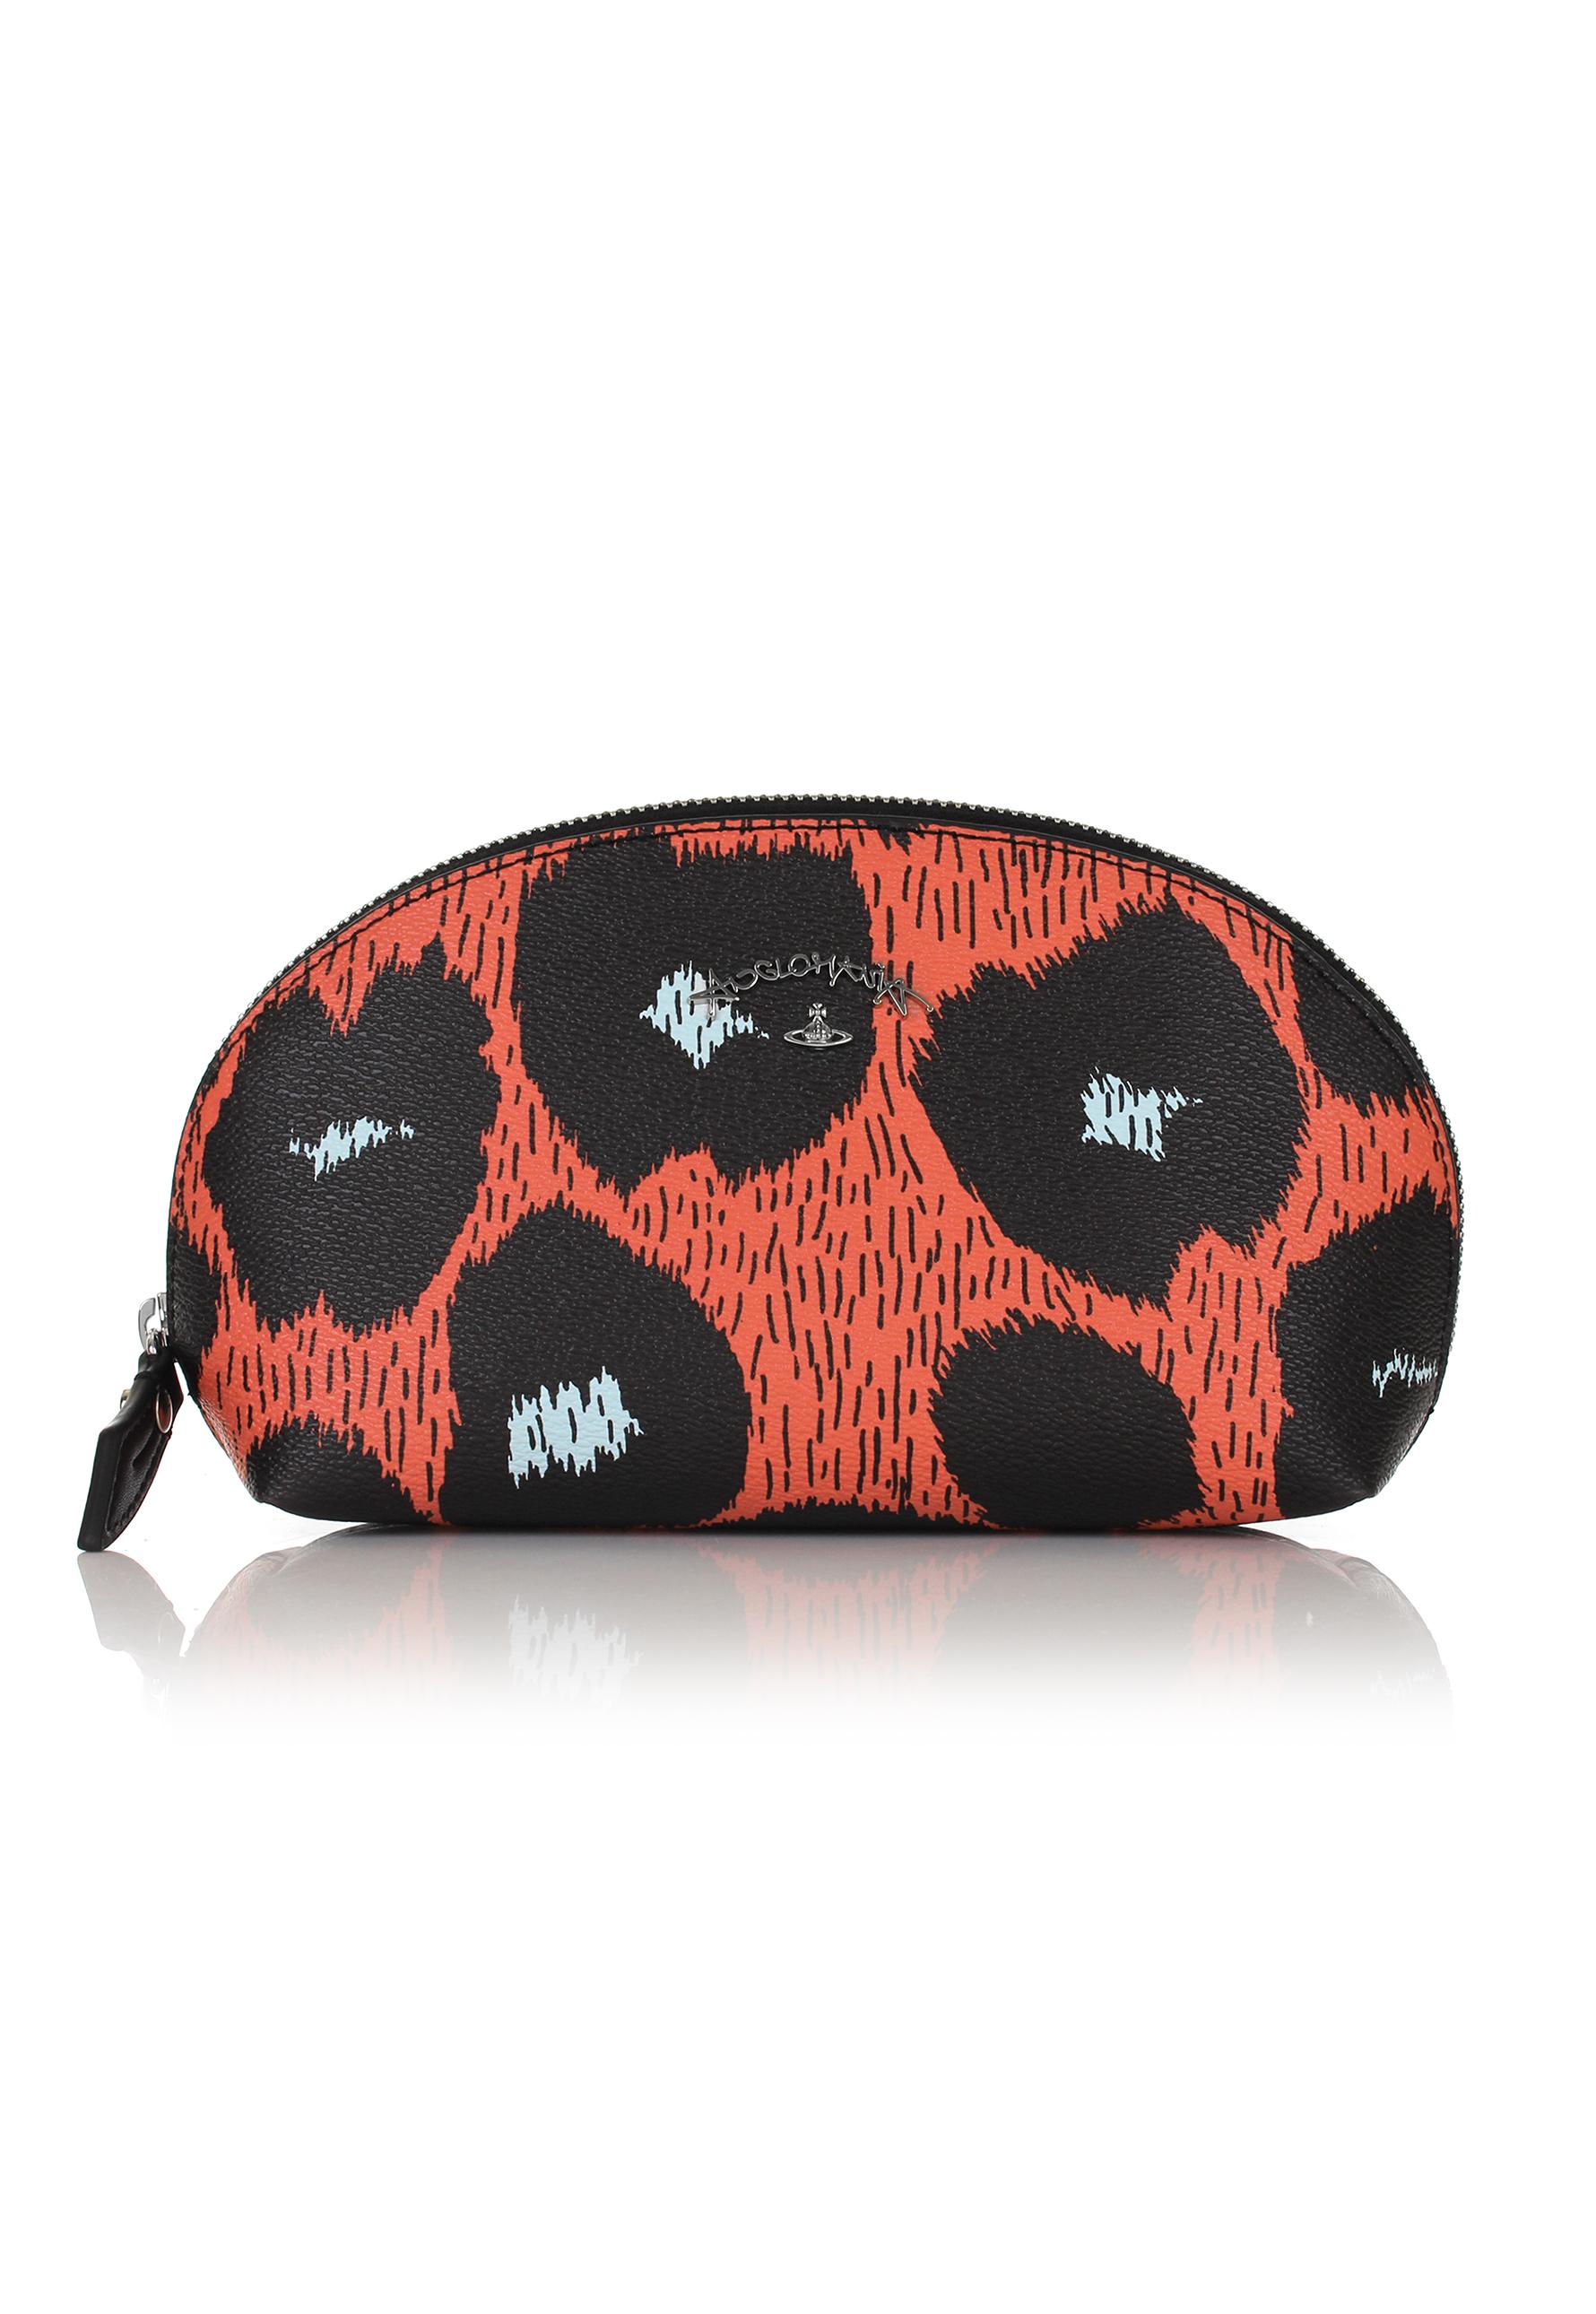 444dc61f49 Lyst - Vivienne Westwood Leopardmania 35084 Make Up Bag Orange in Orange